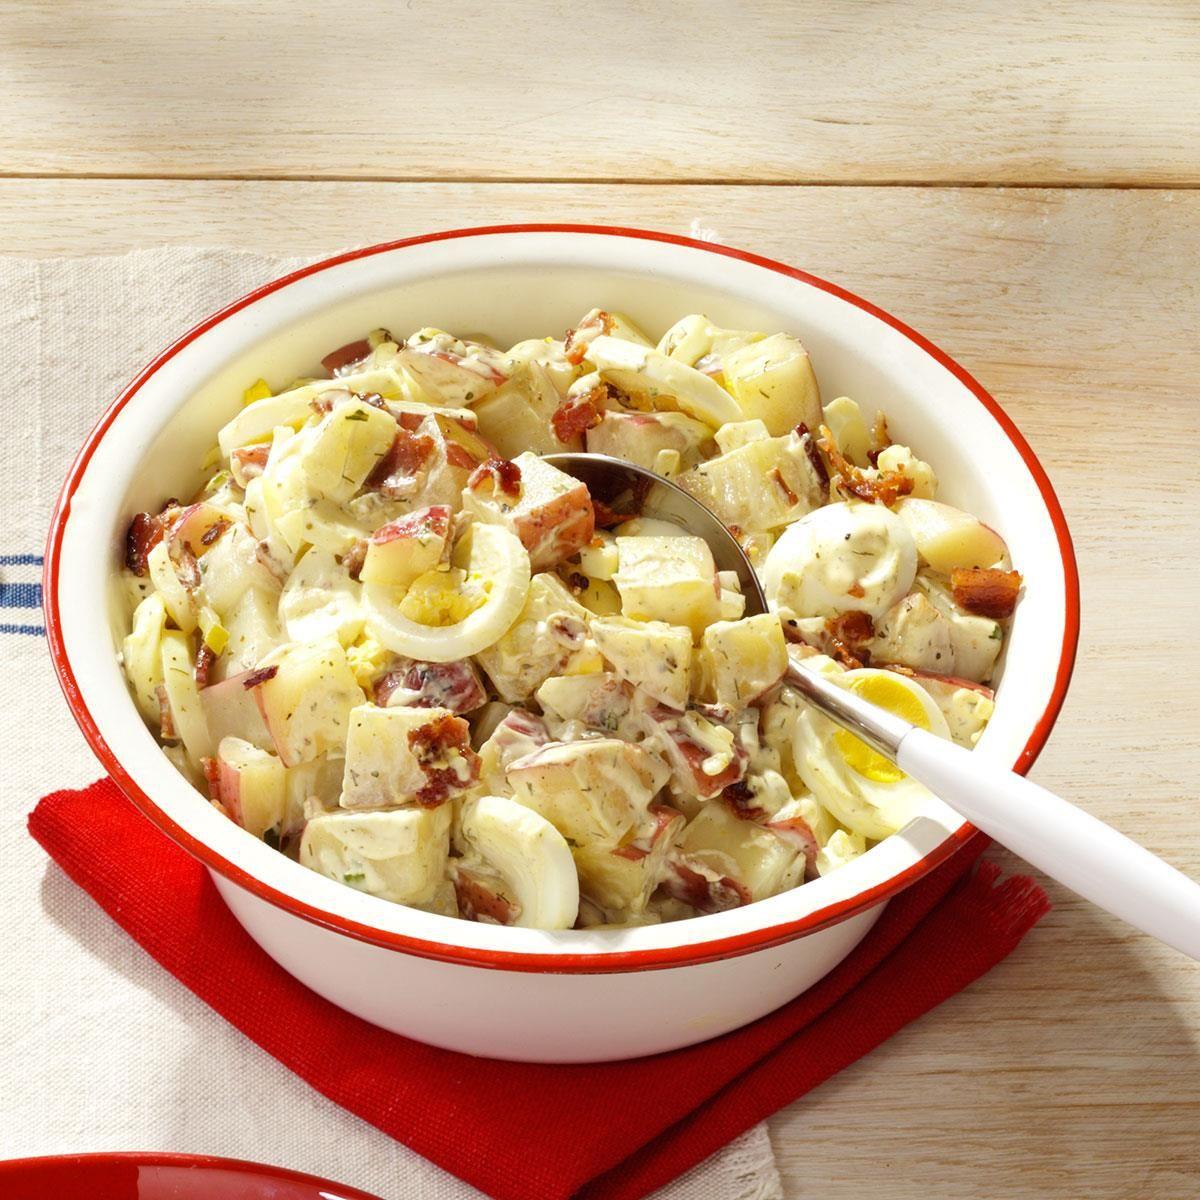 Potato Salad Recipe With Egg And Vinegar